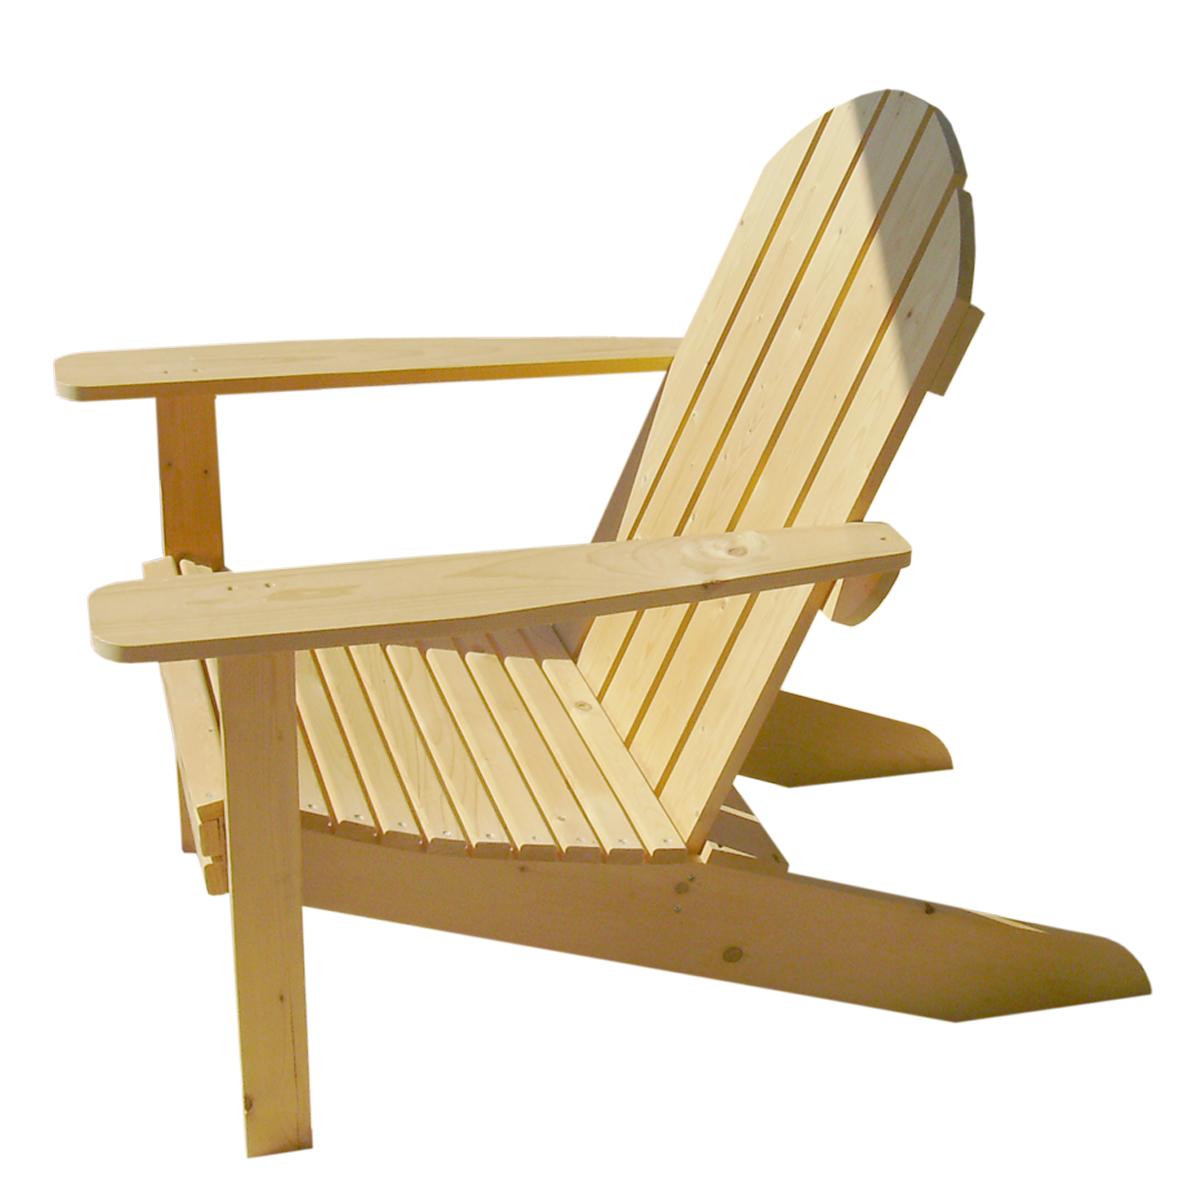 Woodwork by Pe Muskoka chair